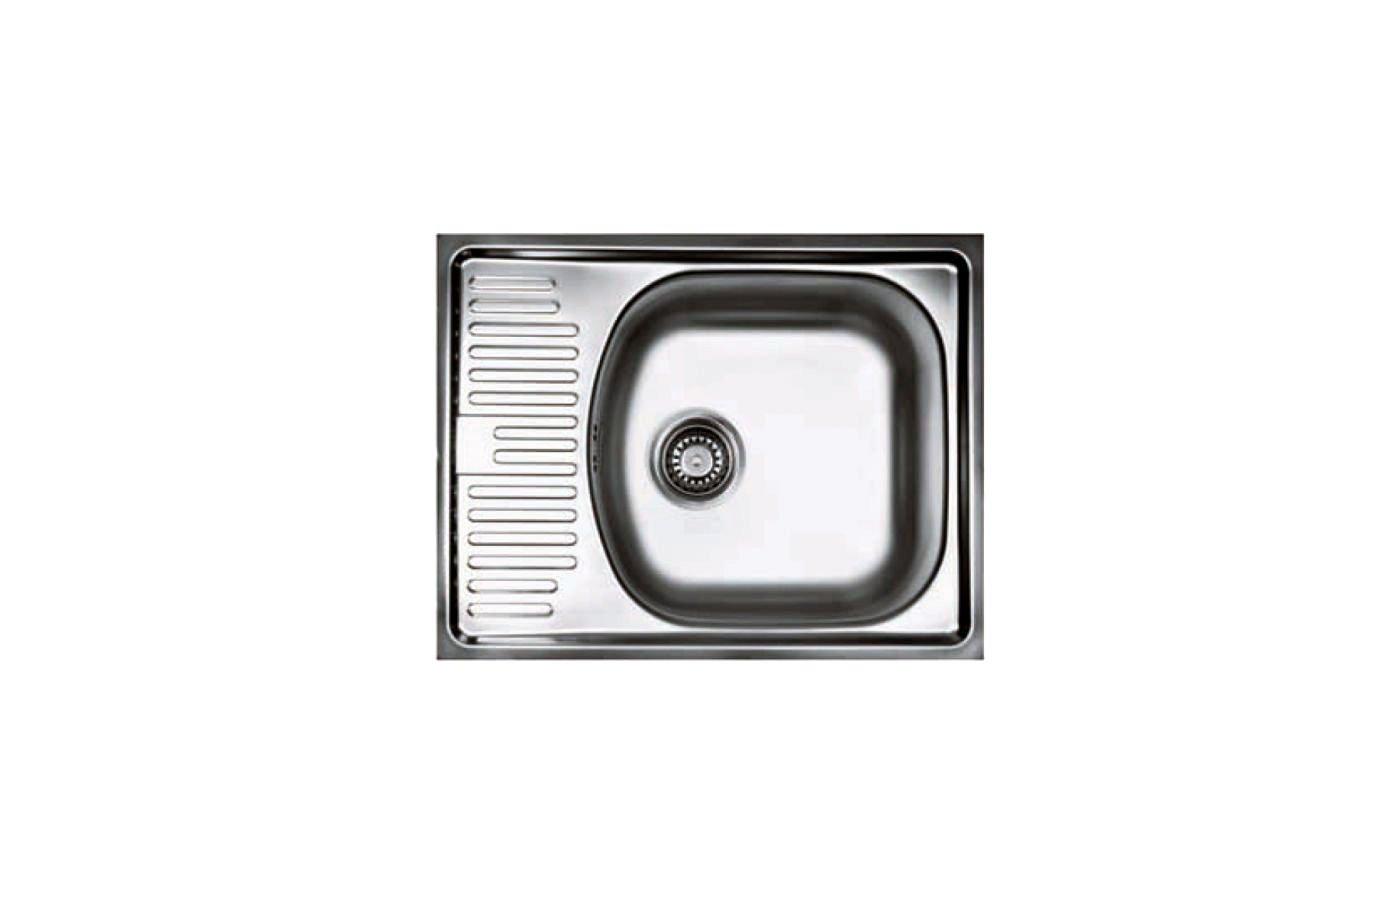 Кухонная мойка FRANKE ETN 611-56 Вентиль 1.5 + комплект для монтажа